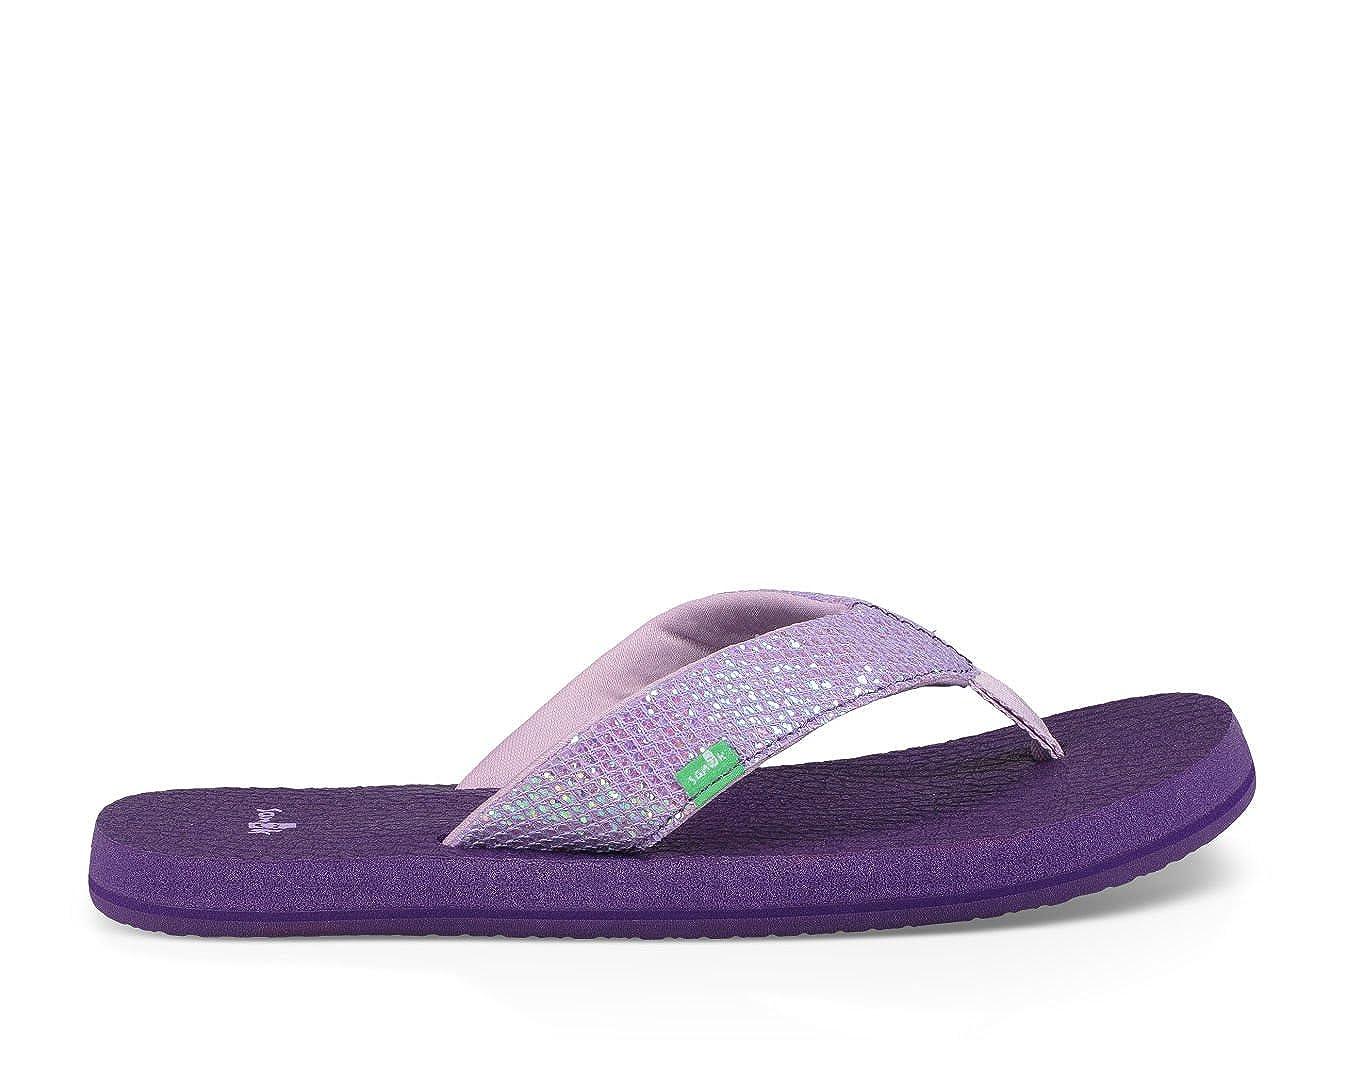 Sanuk Youth Yoga Glitter Sandal /& Cooling Towel Bundle